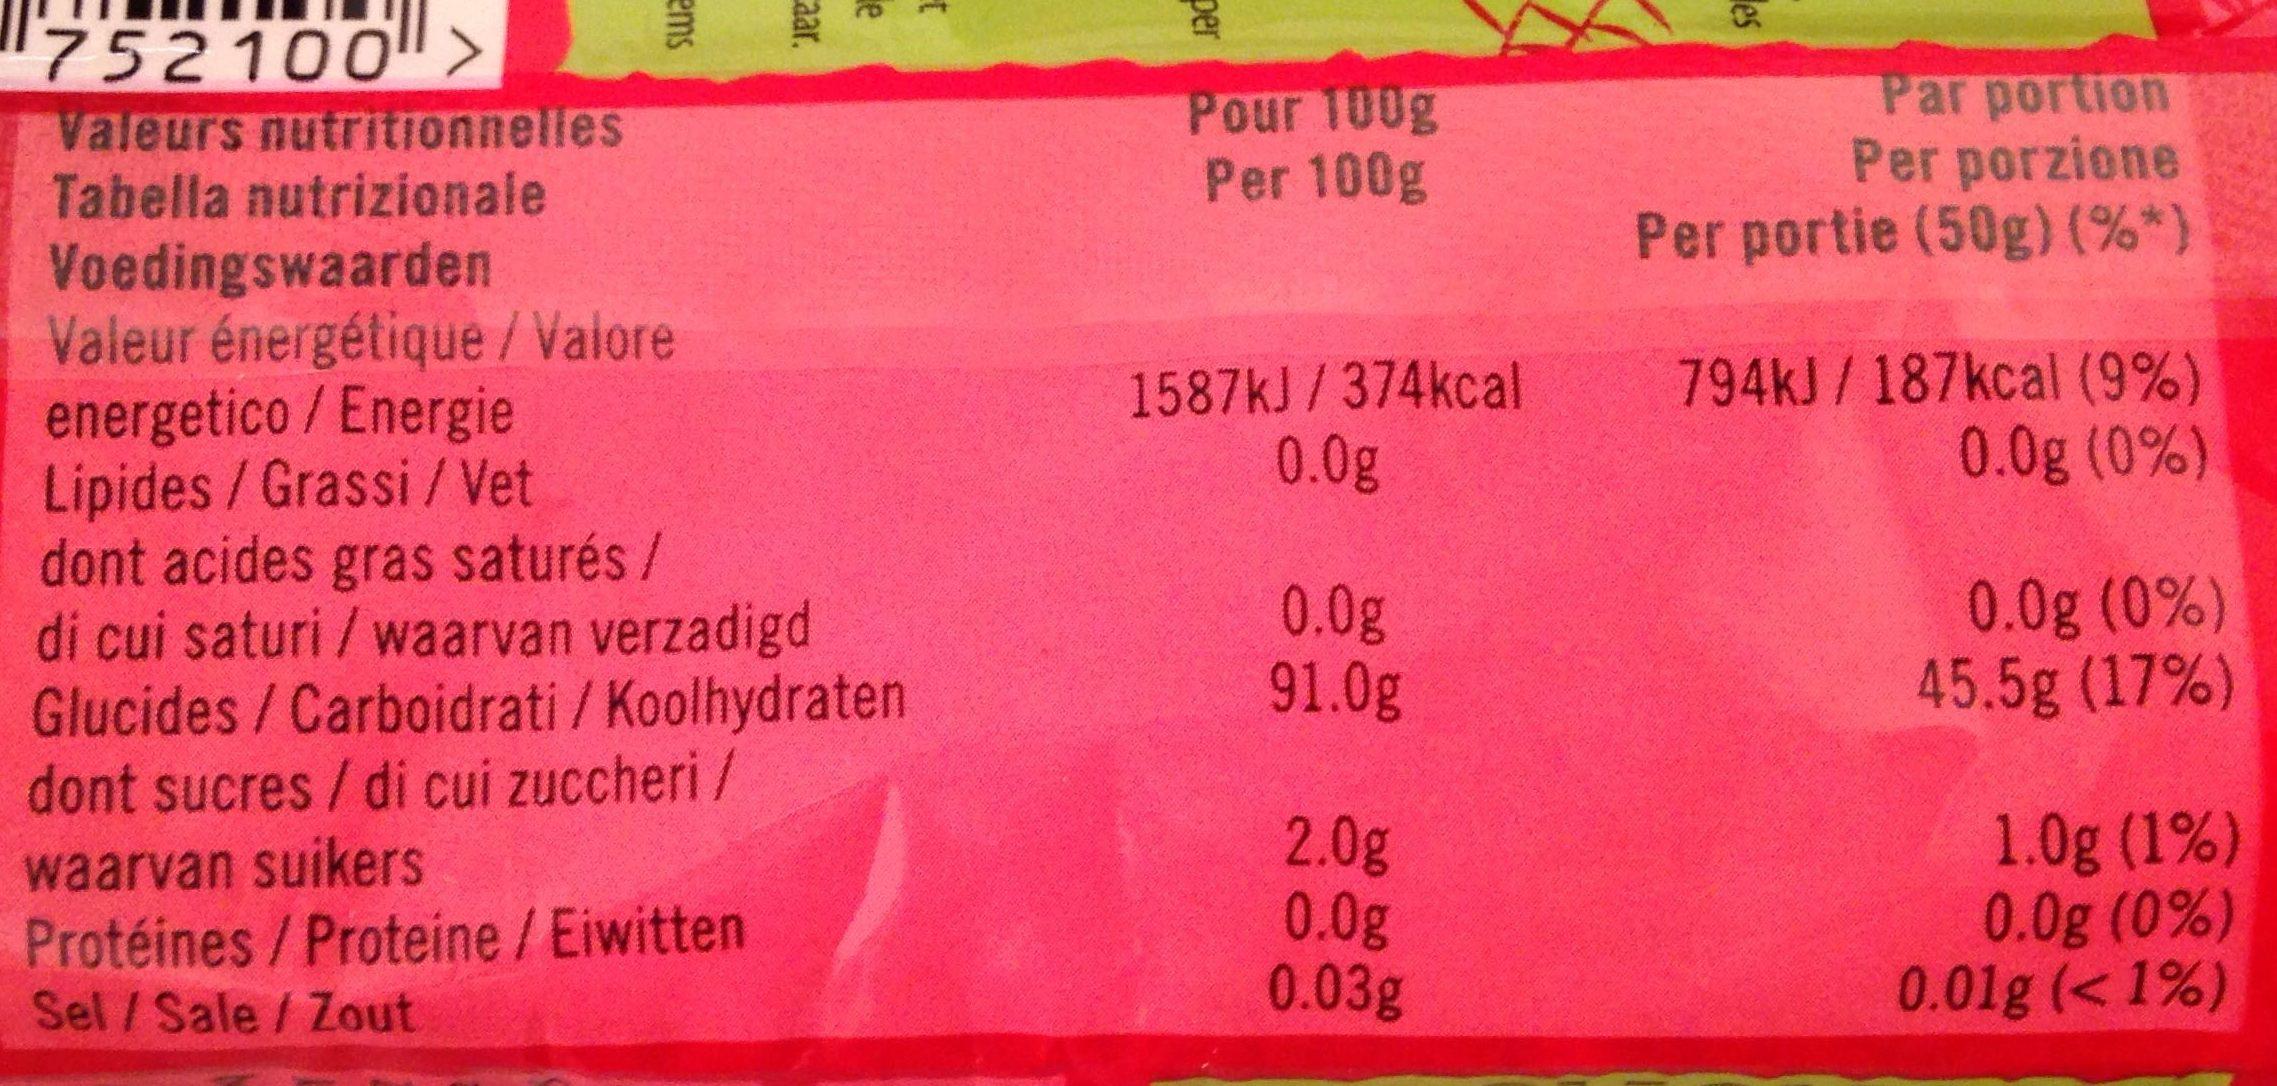 Vermicelles de soja - Nutrition facts